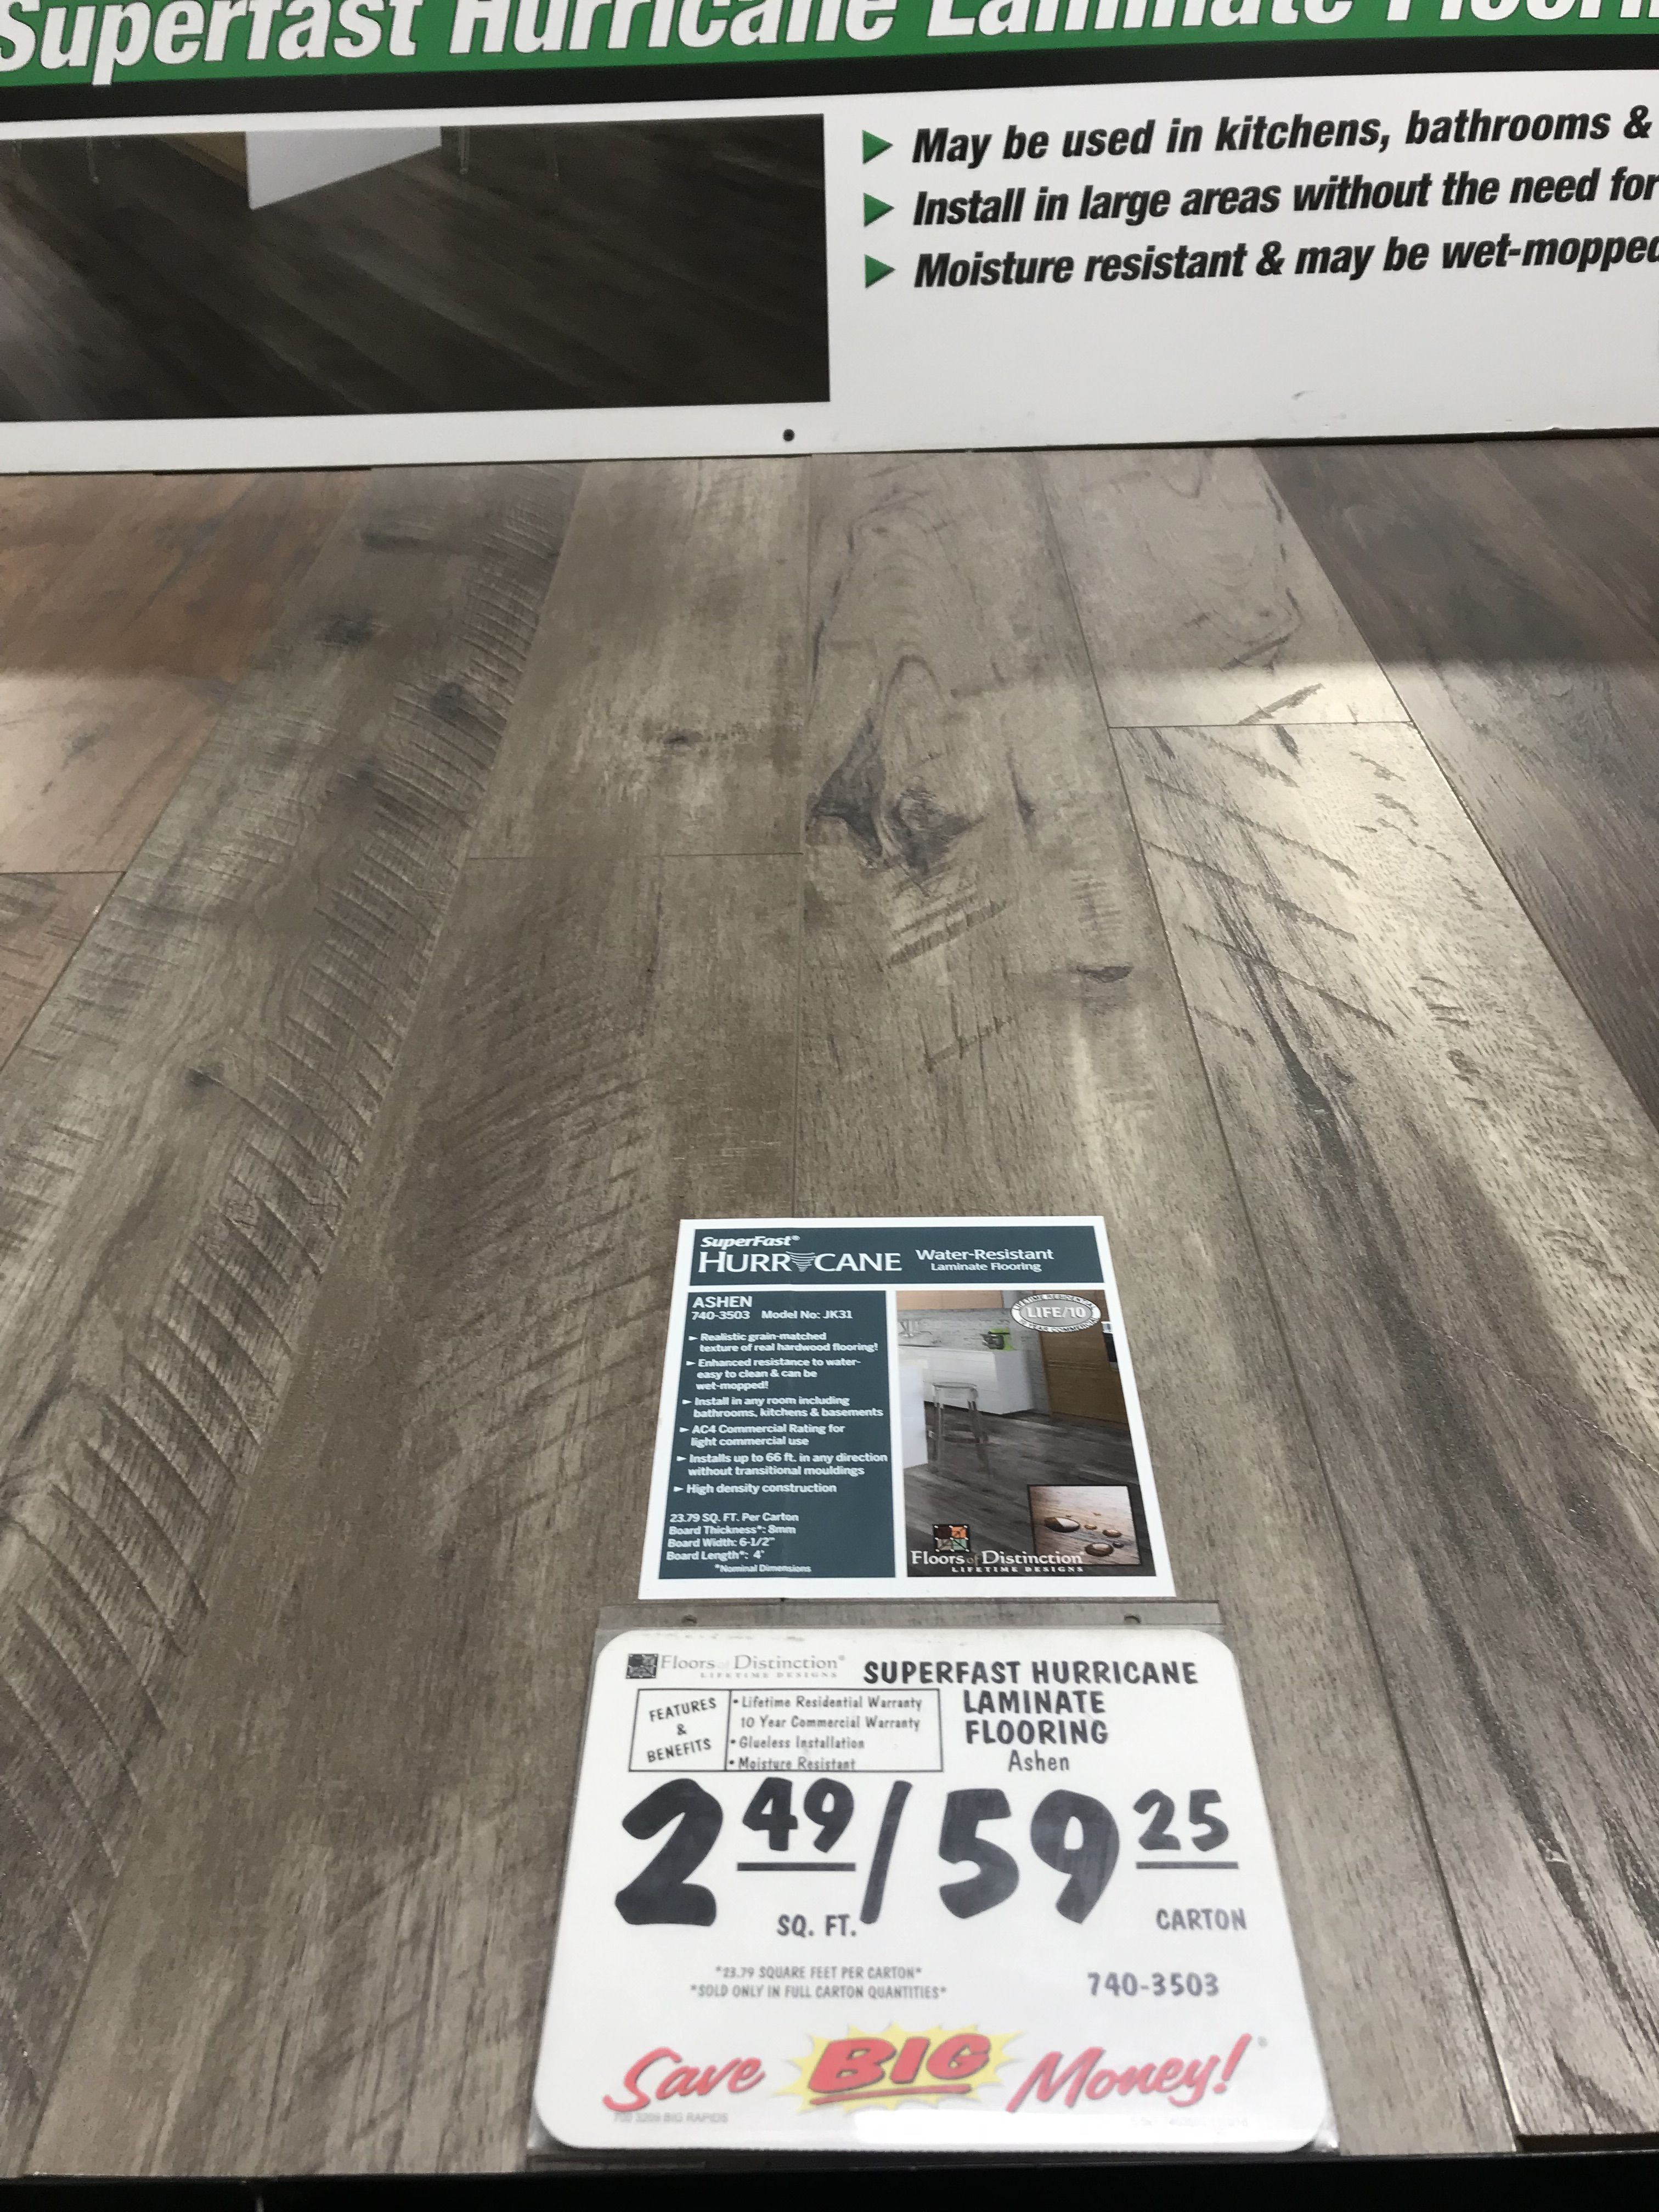 Laminate Flooring, Superfast Hurricane Laminate Flooring